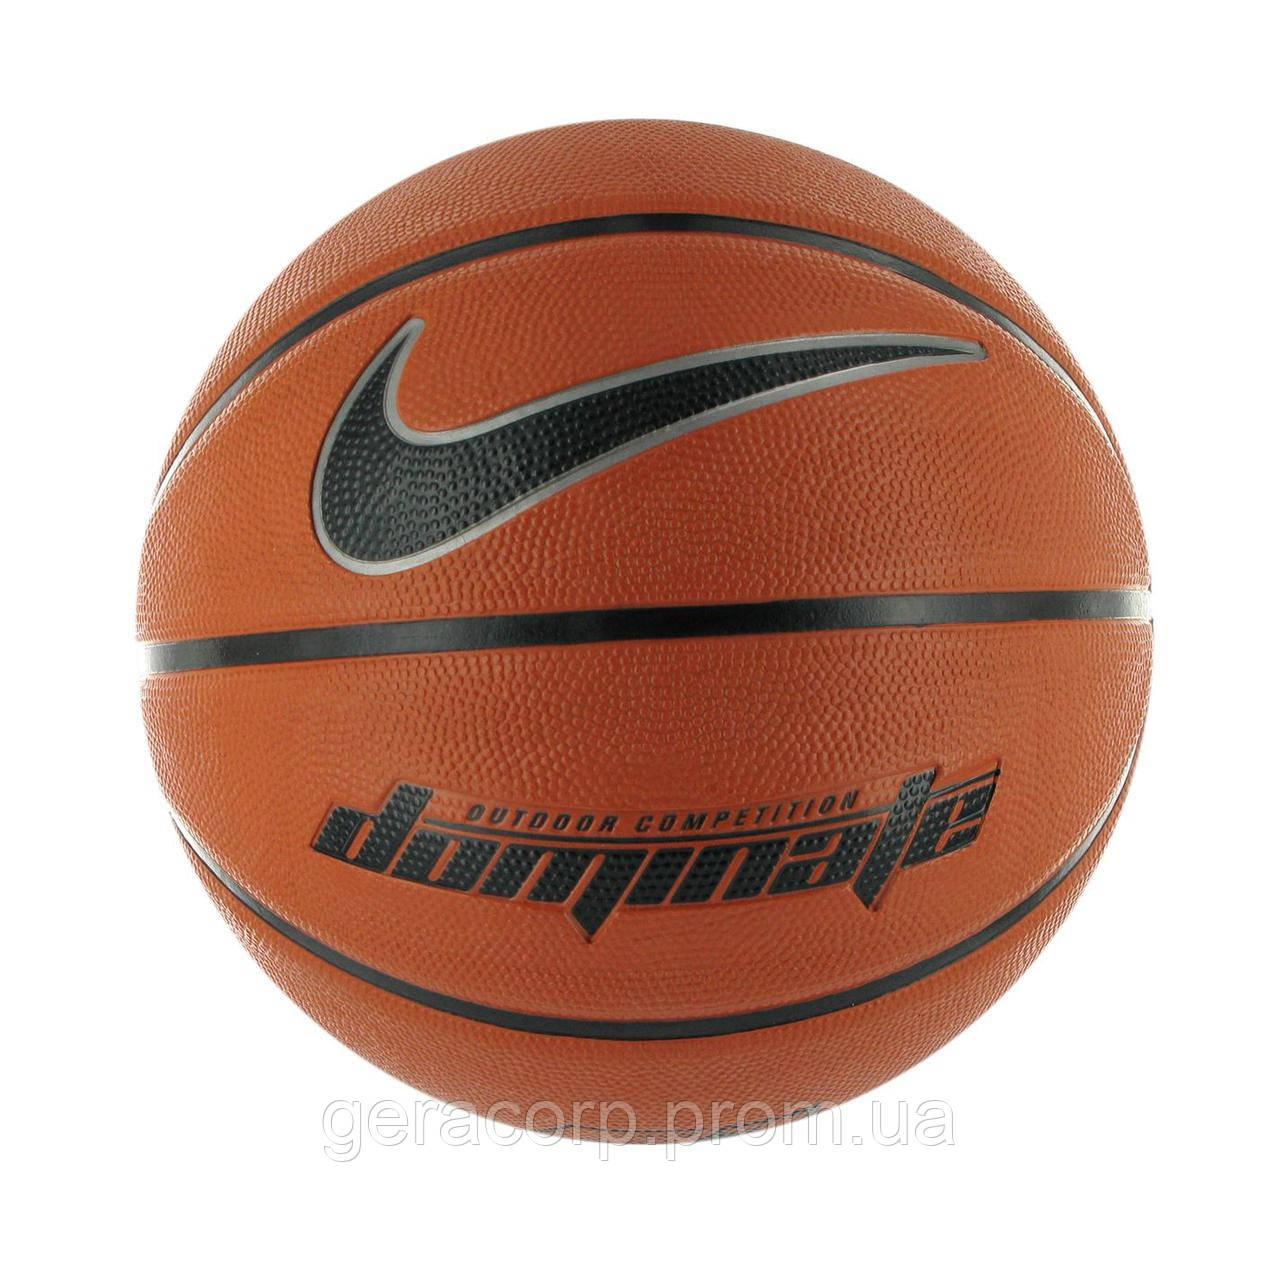 2b6e8a7d Мяч баскетбольный Nike Dominate Orange/Black , цена 700 грн., купить ...